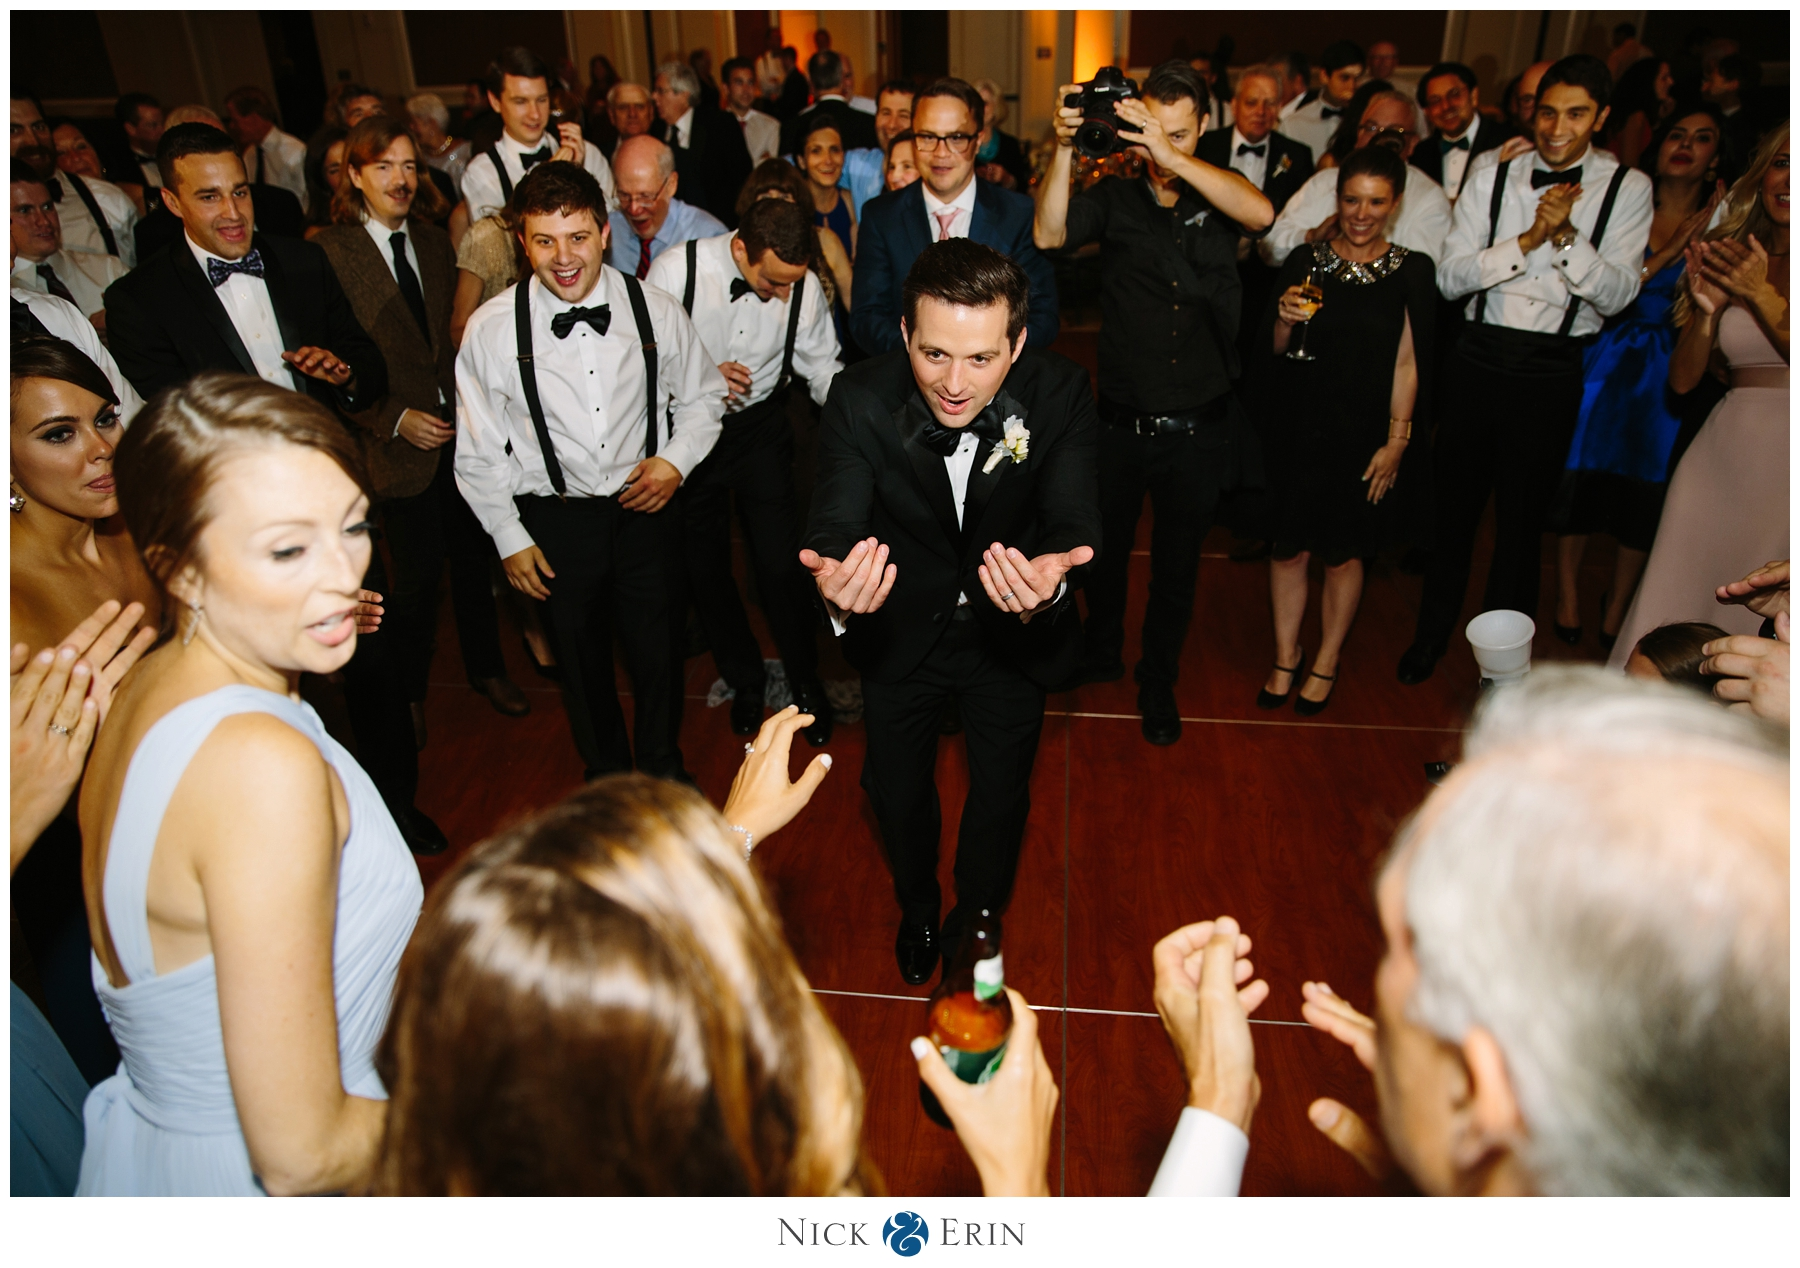 donner_photography_washington-dc-wedding_ariel-patrick_0083